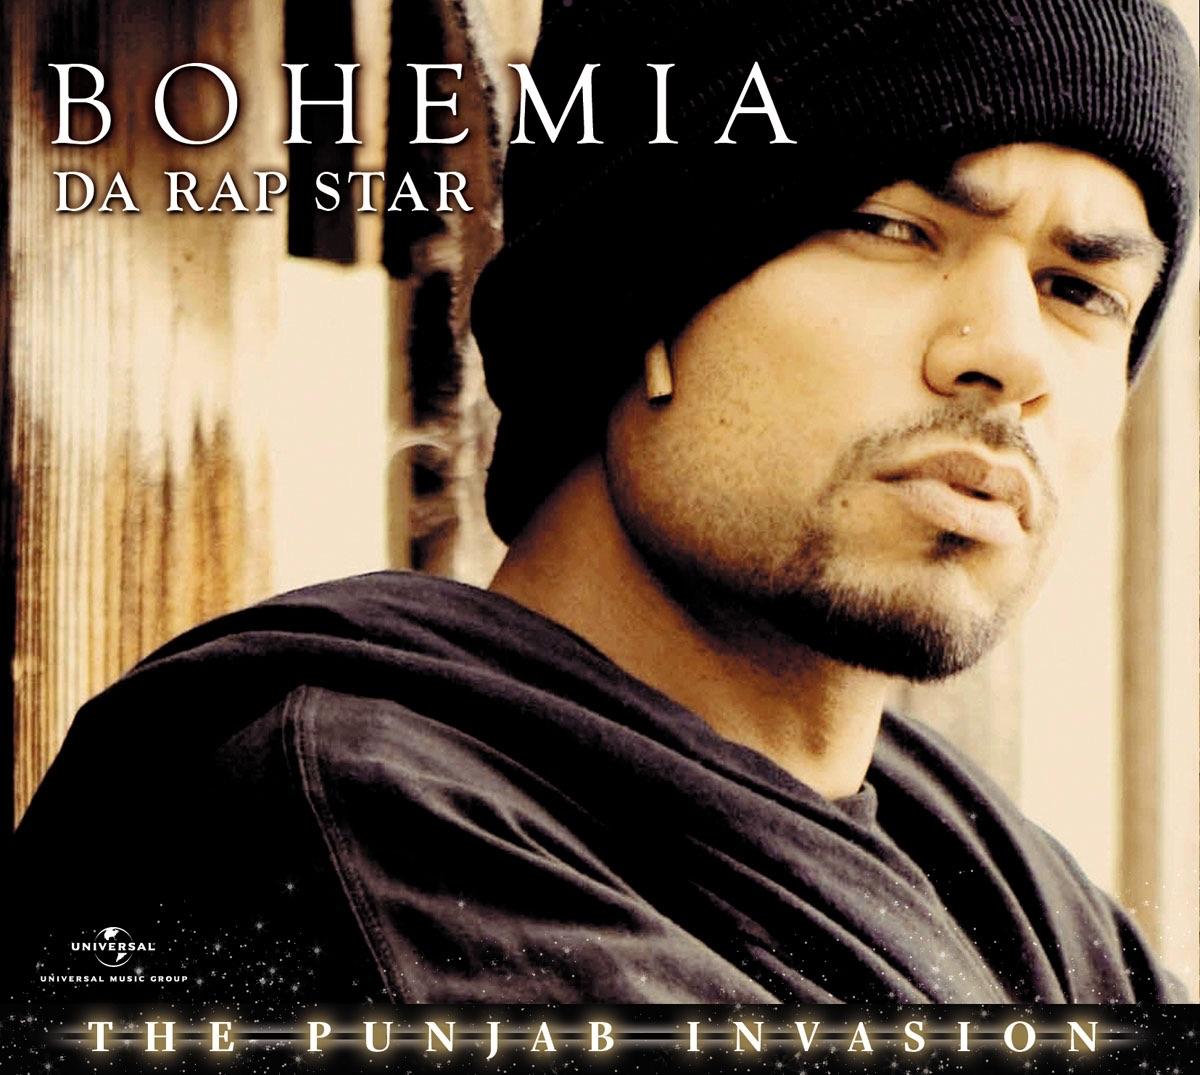 Libro - Wikipedia Bohemia punjabi rap star photos